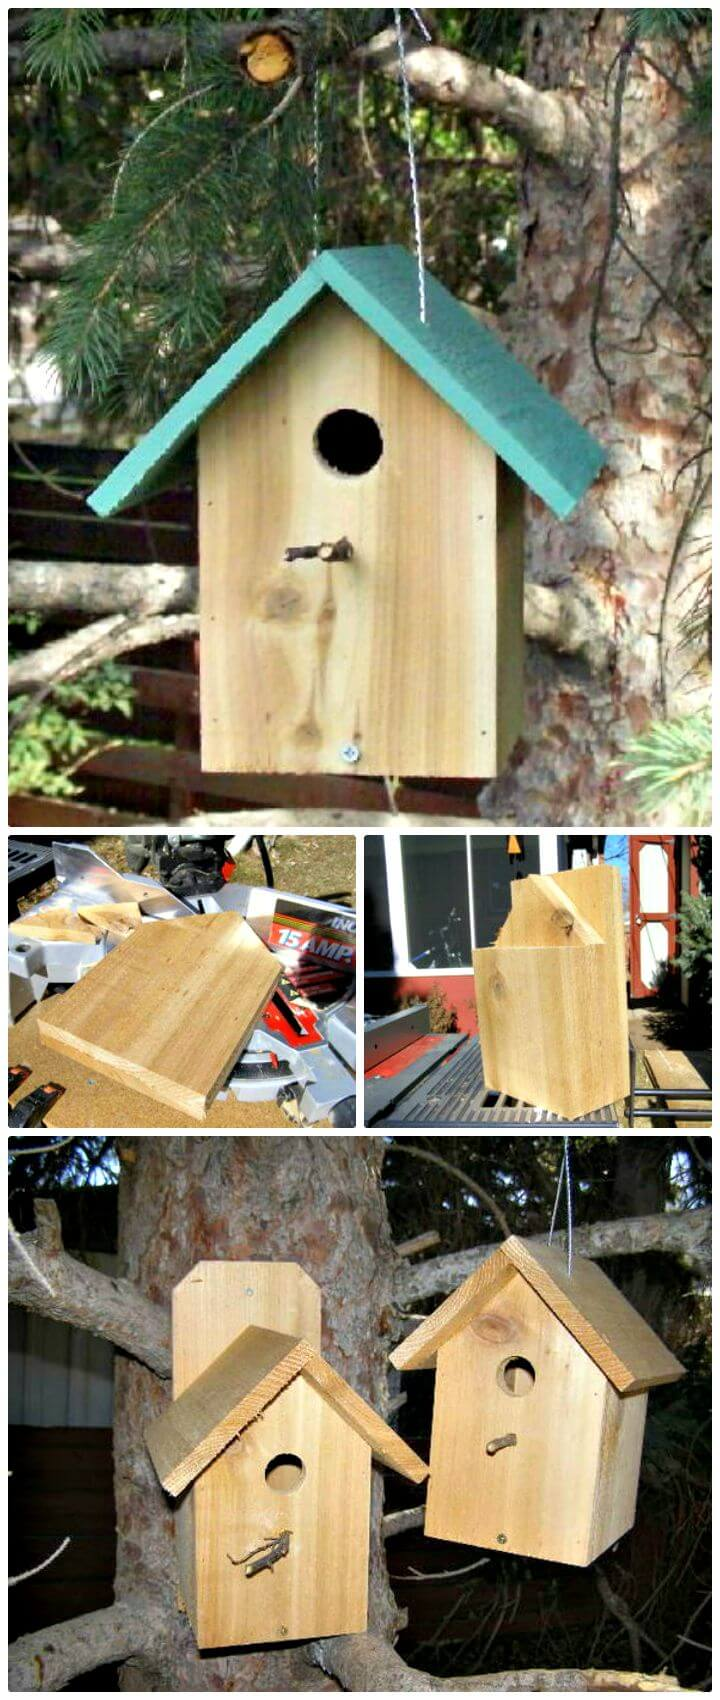 Easy And Cool Diy Birdhouse Ideas Diycraftsguru